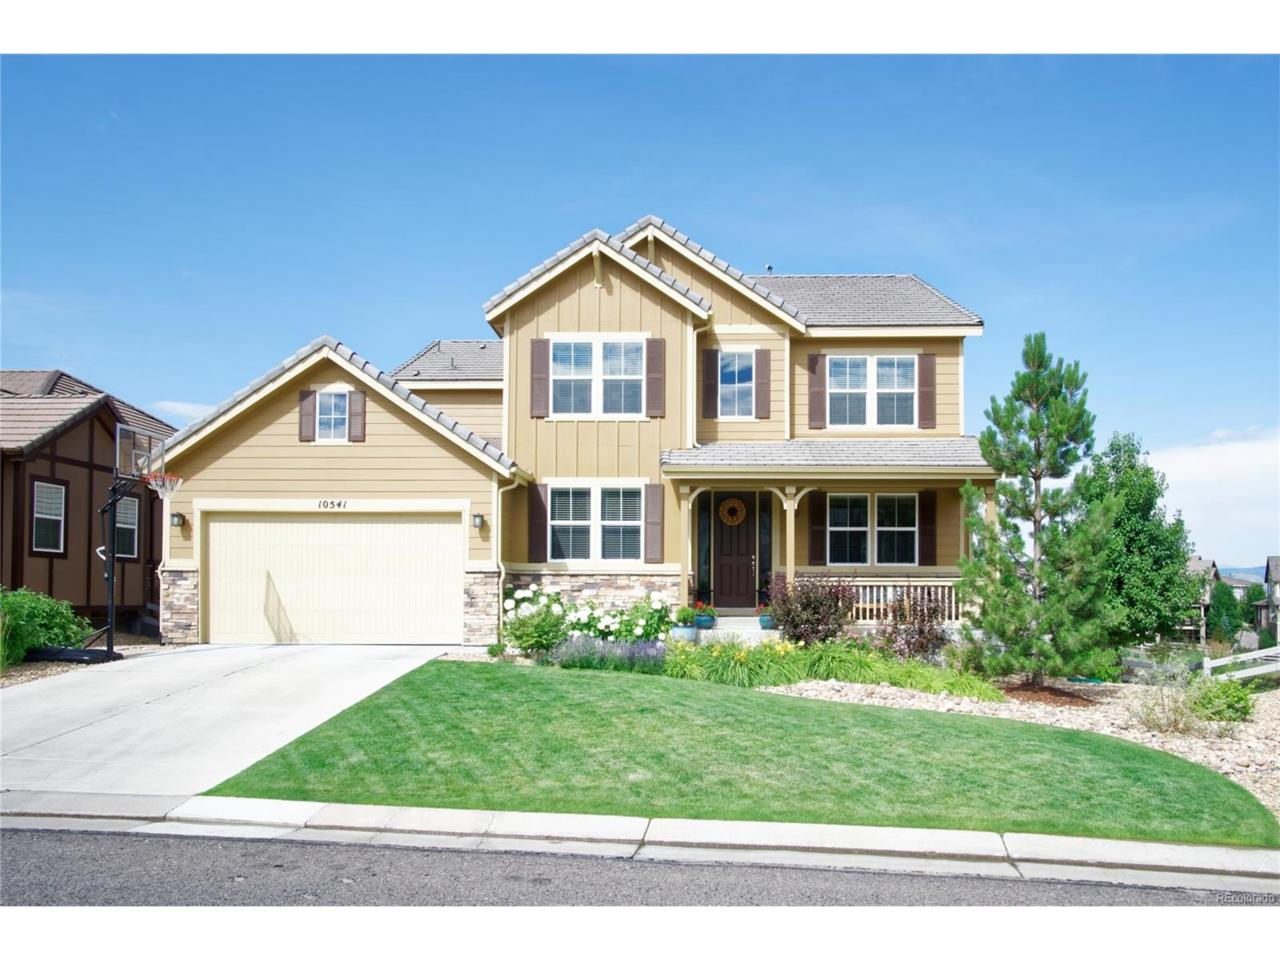 10541 Skyreach Road, Highlands Ranch, CO 80126 (MLS #2932351) :: 8z Real Estate